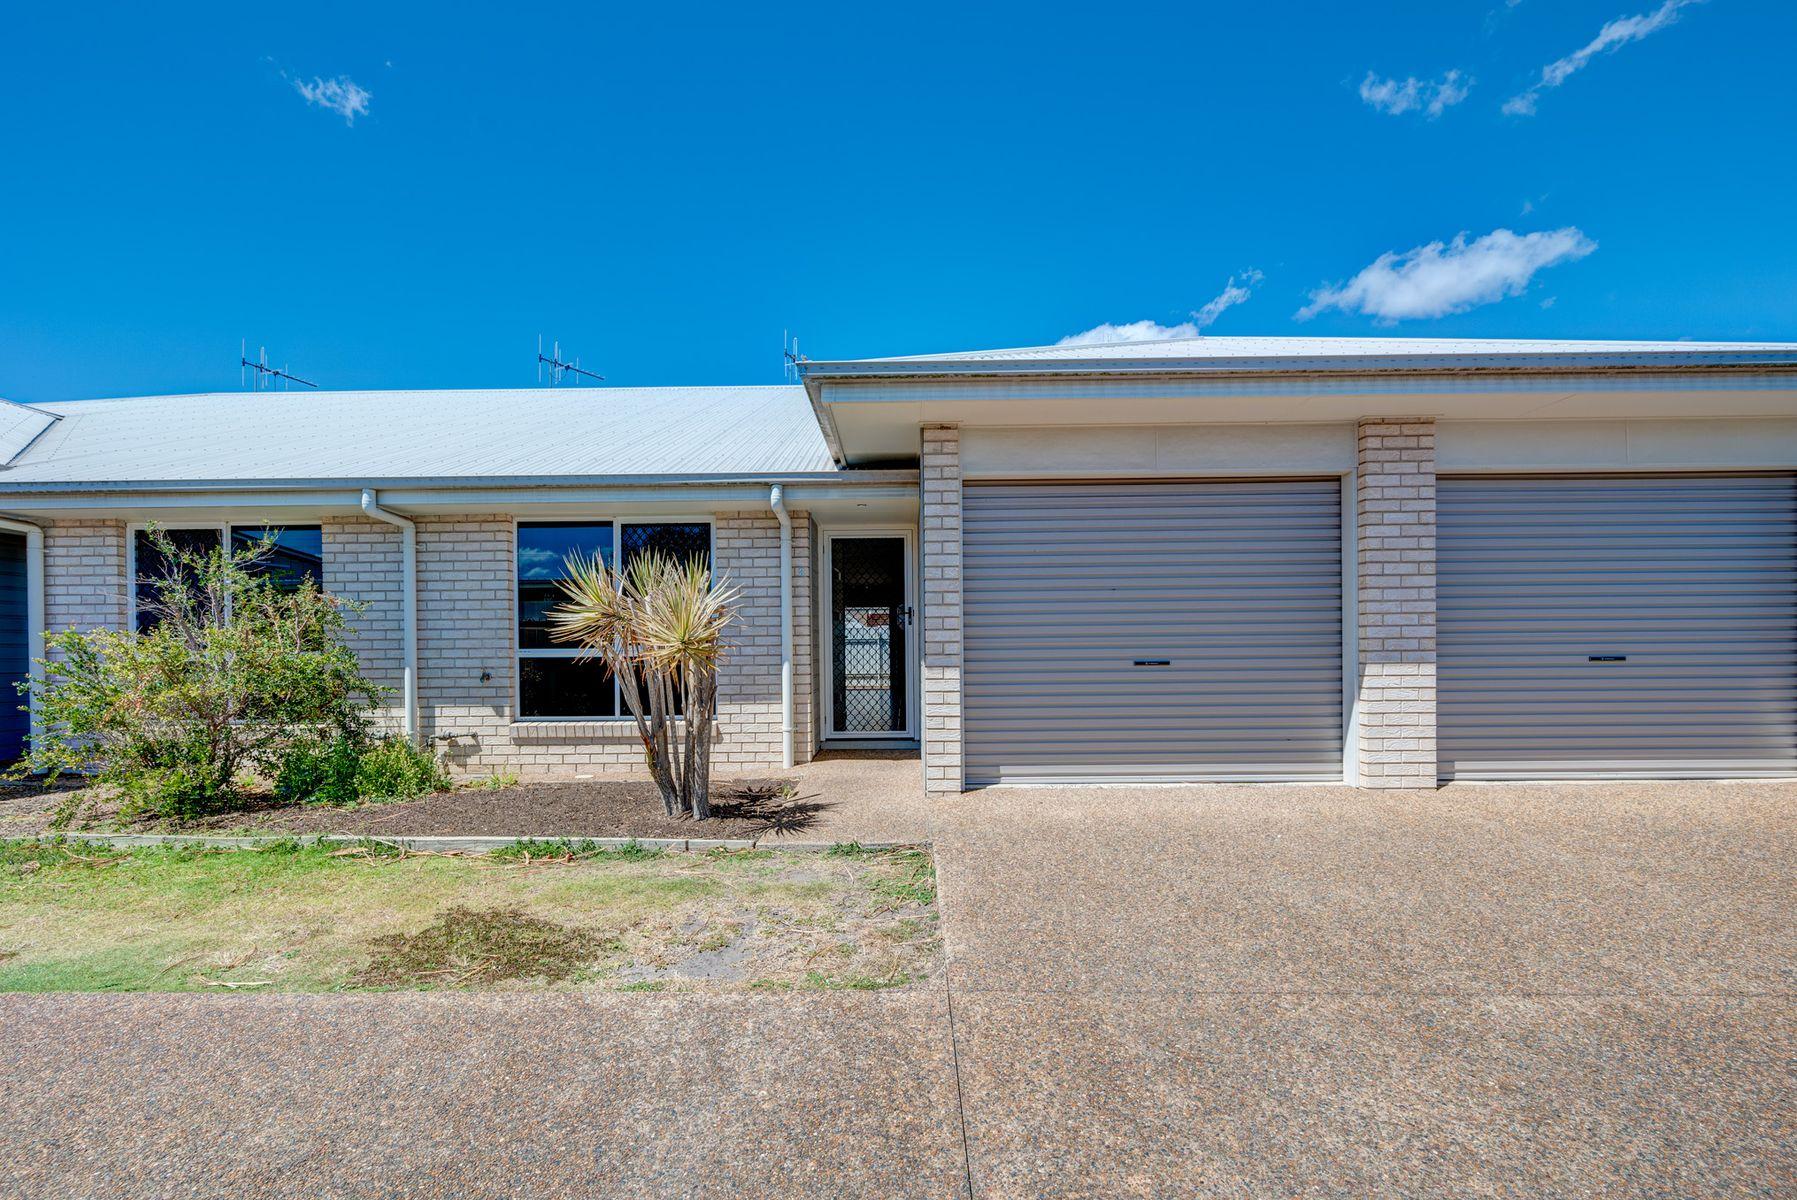 2/24 Water Street, Bundaberg South, QLD 4670